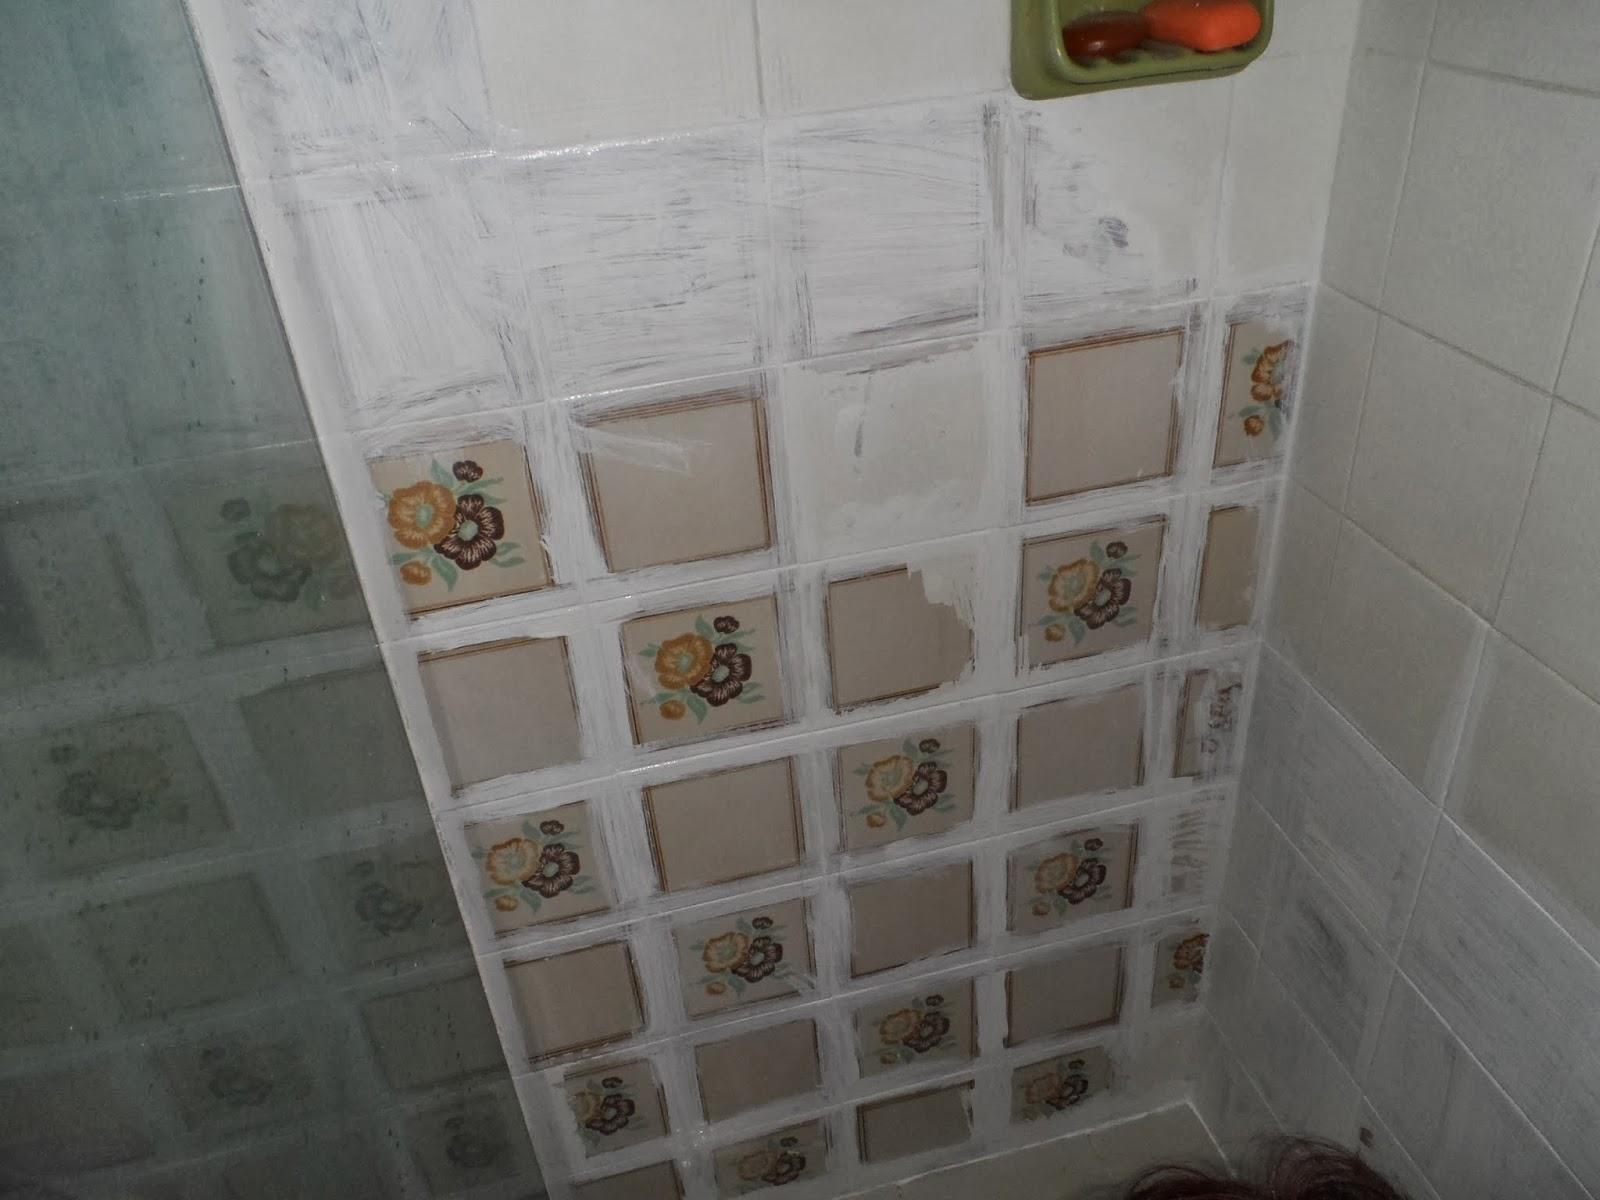 Fazendo arte by r refazendo pintura dos azulejos - Pintar azulejo ...